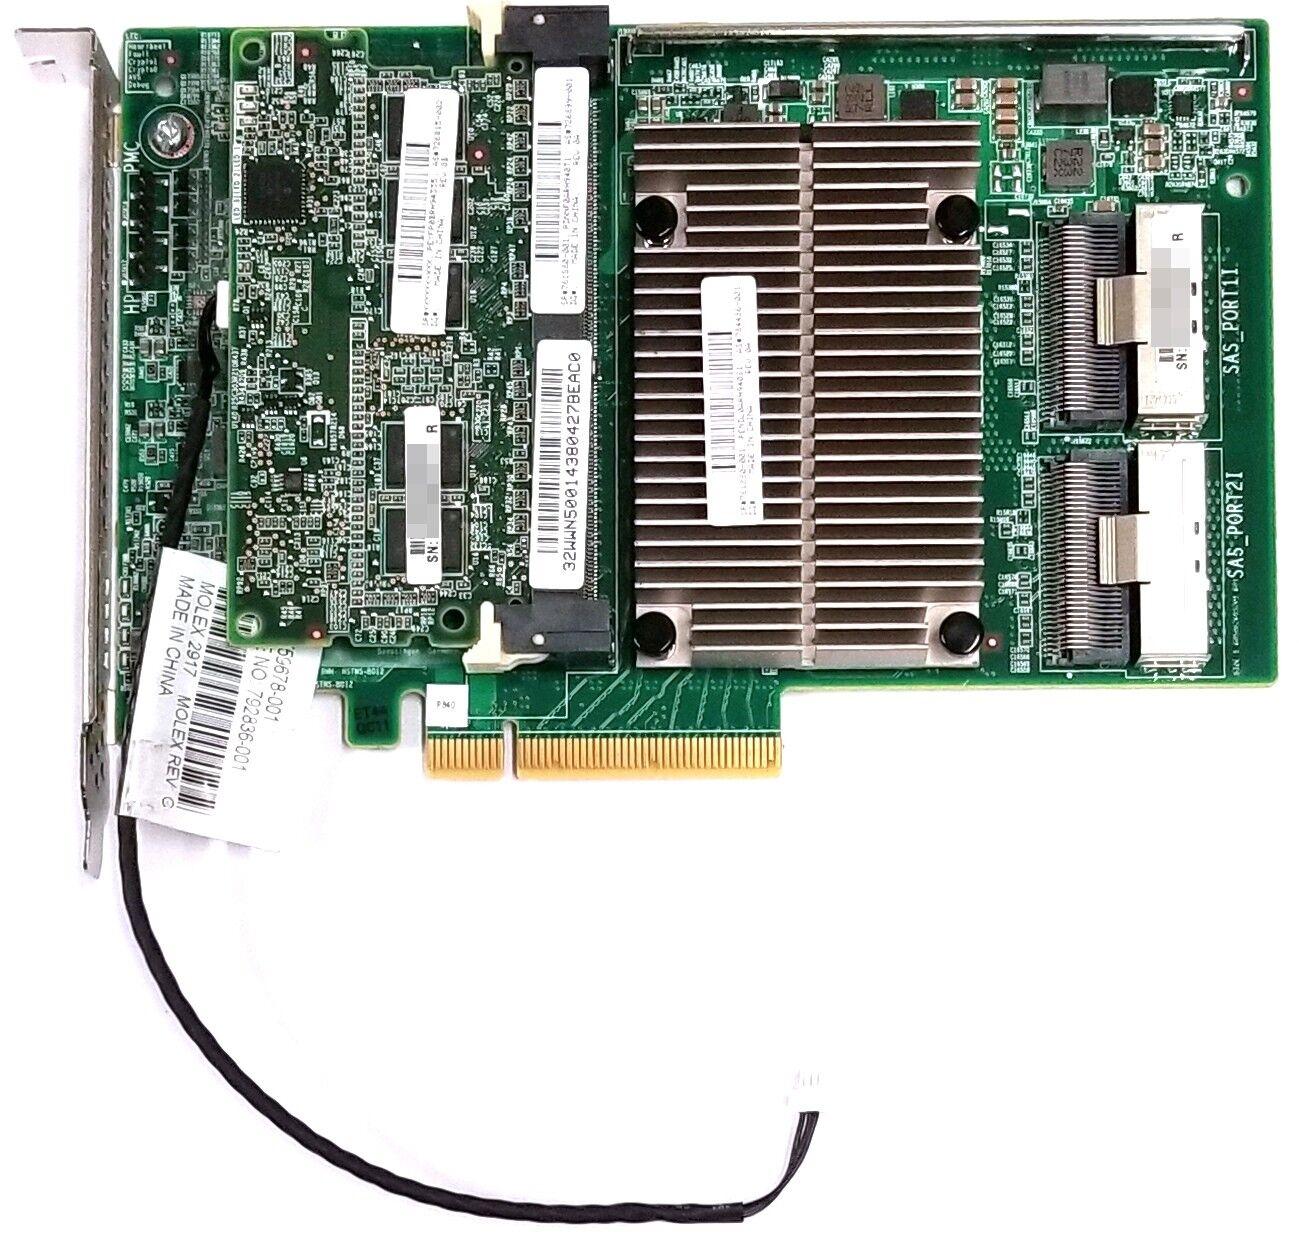 HP 761880-001 Smart Array P840//4G 12GB Controller 726897-B21